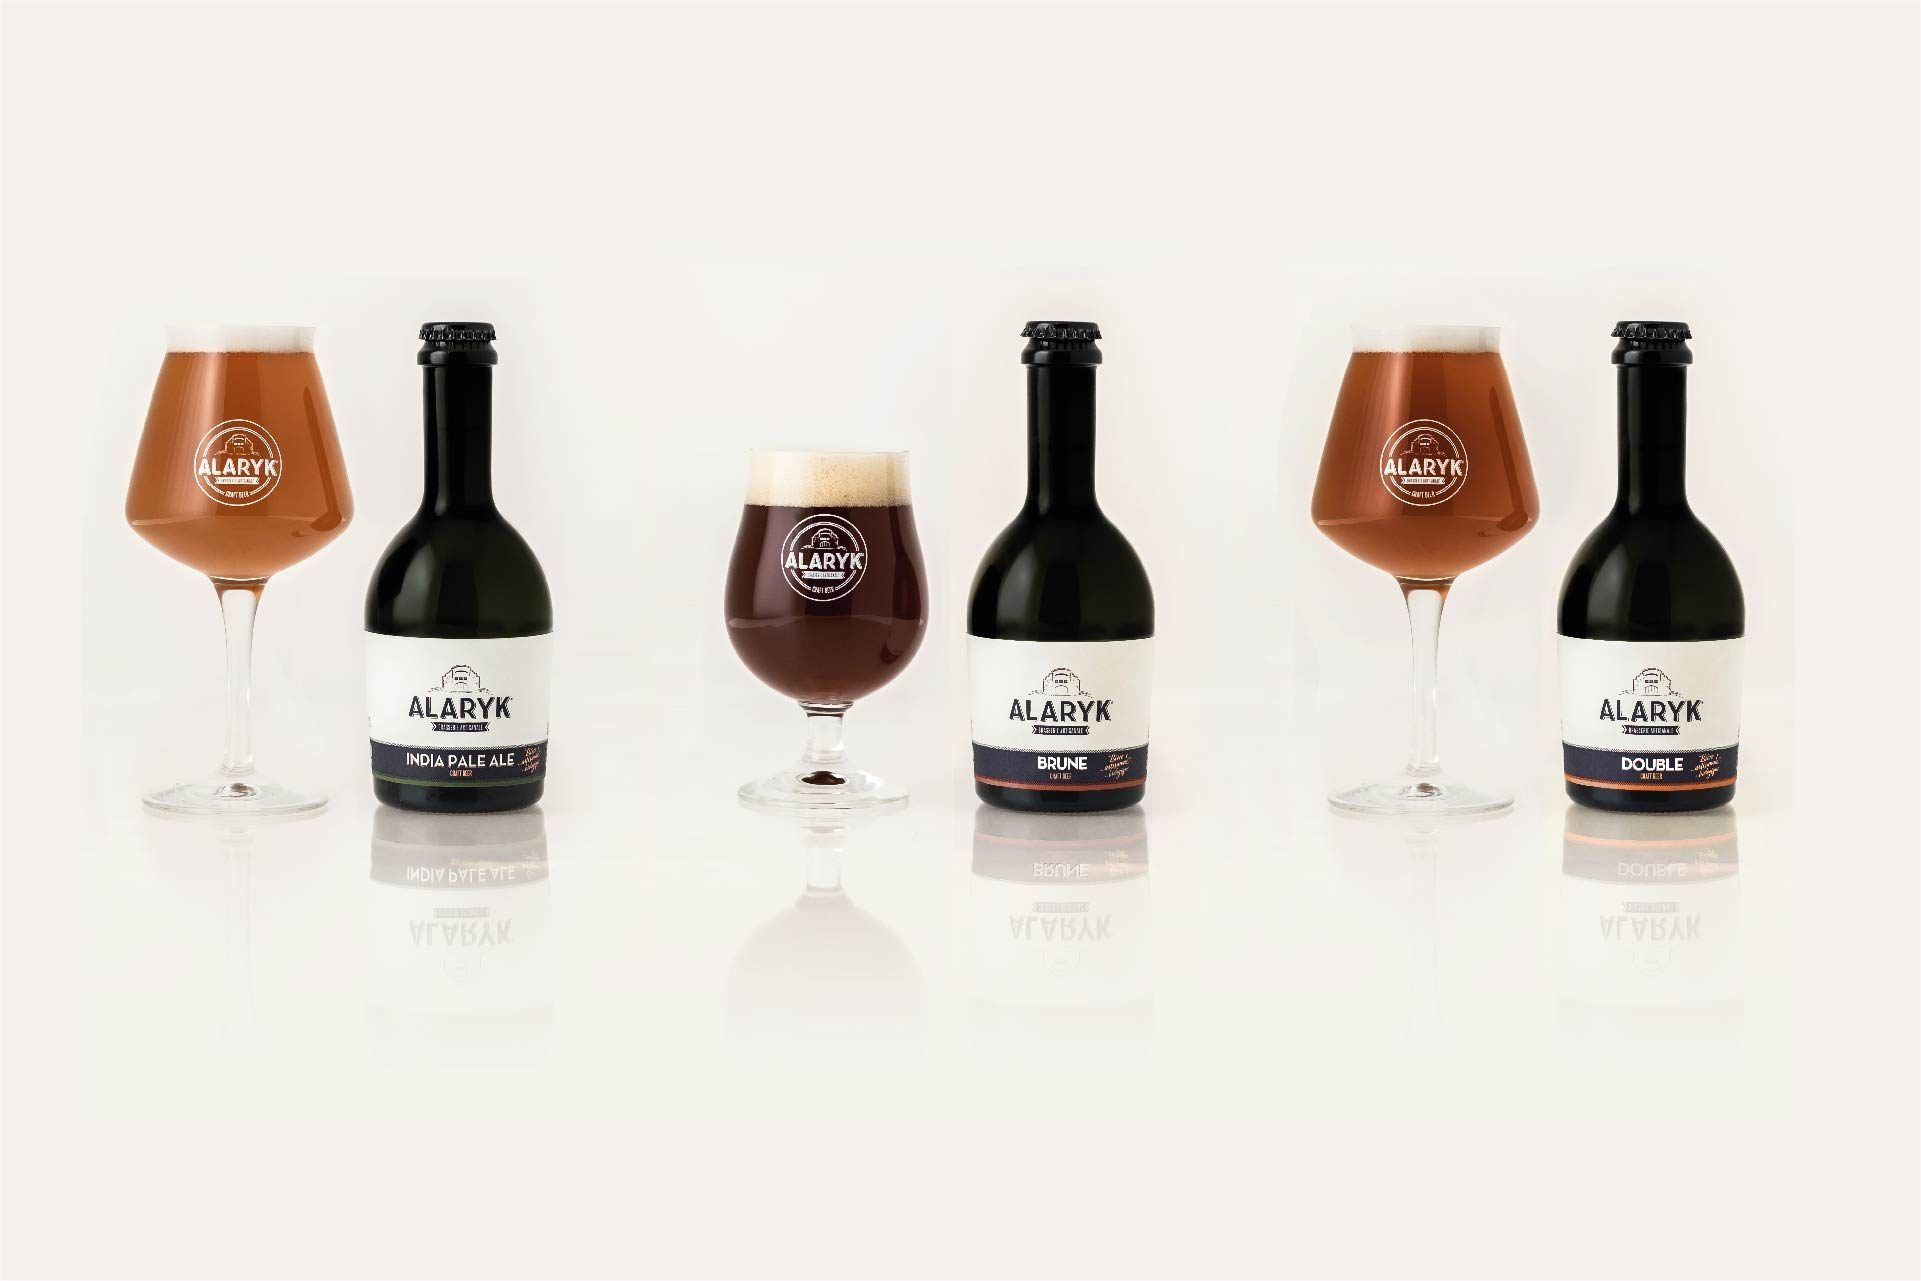 Trio bières artisanales Alaryk bio